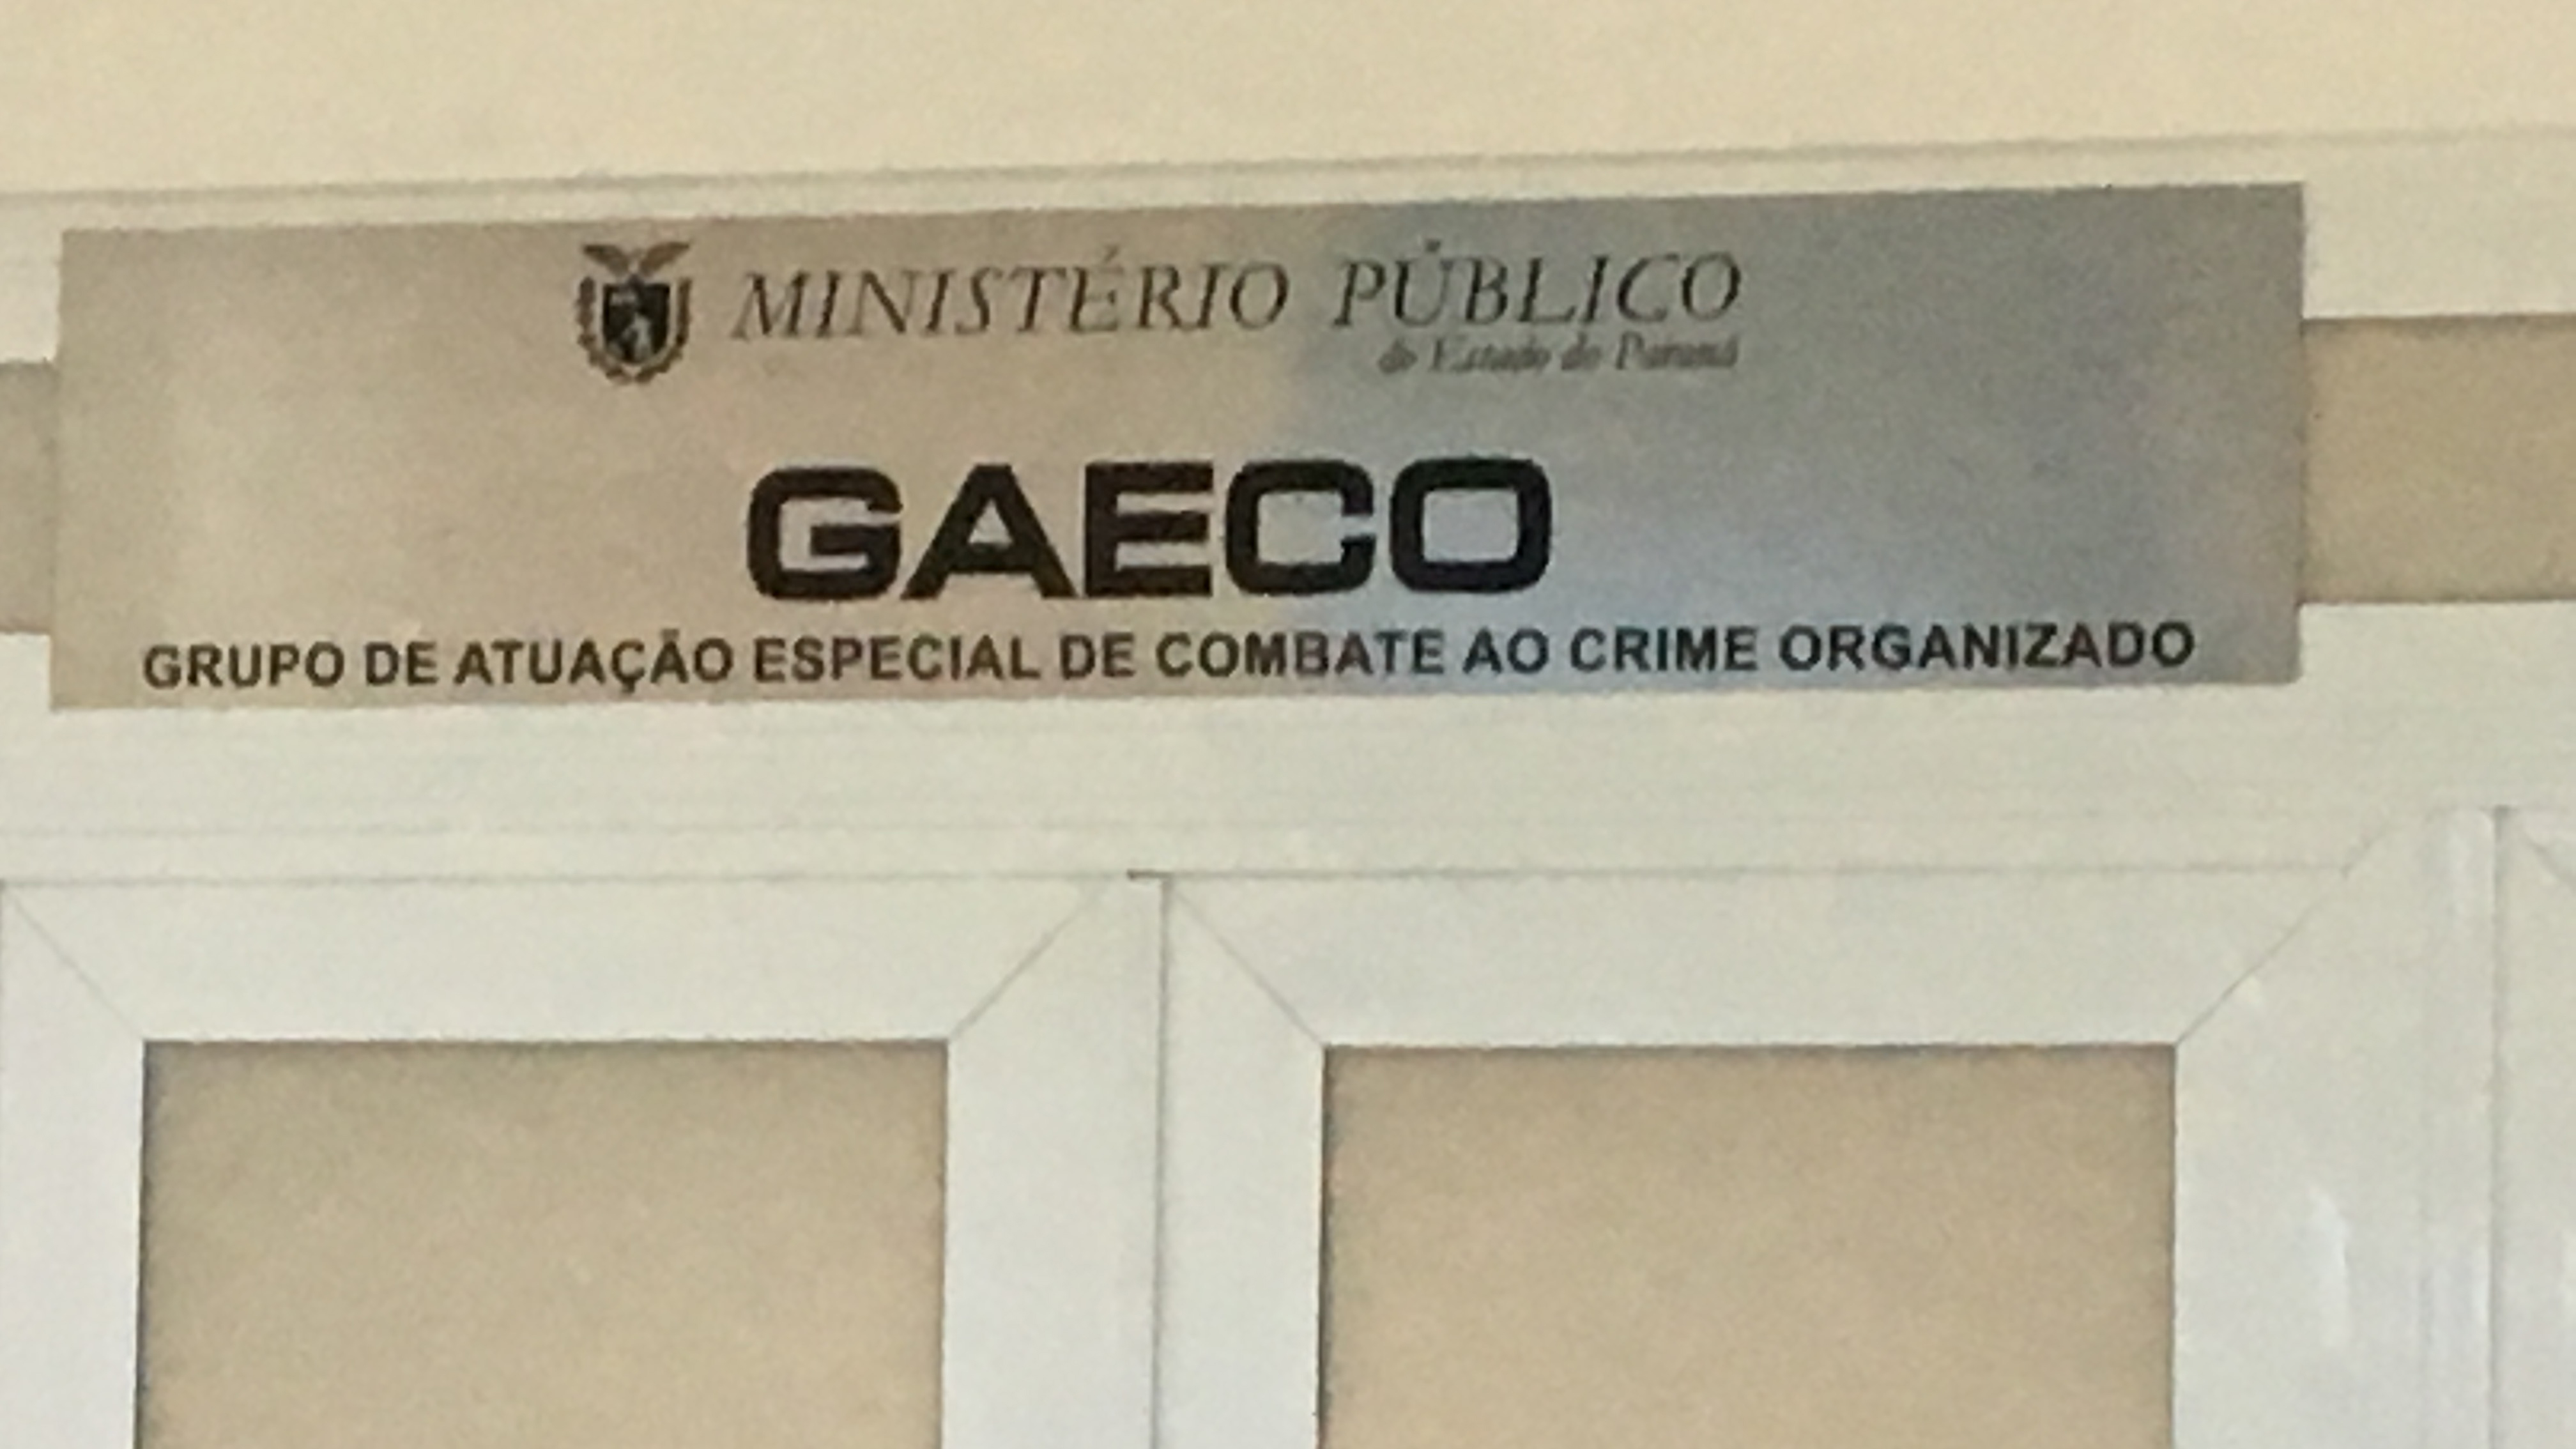 gaecob